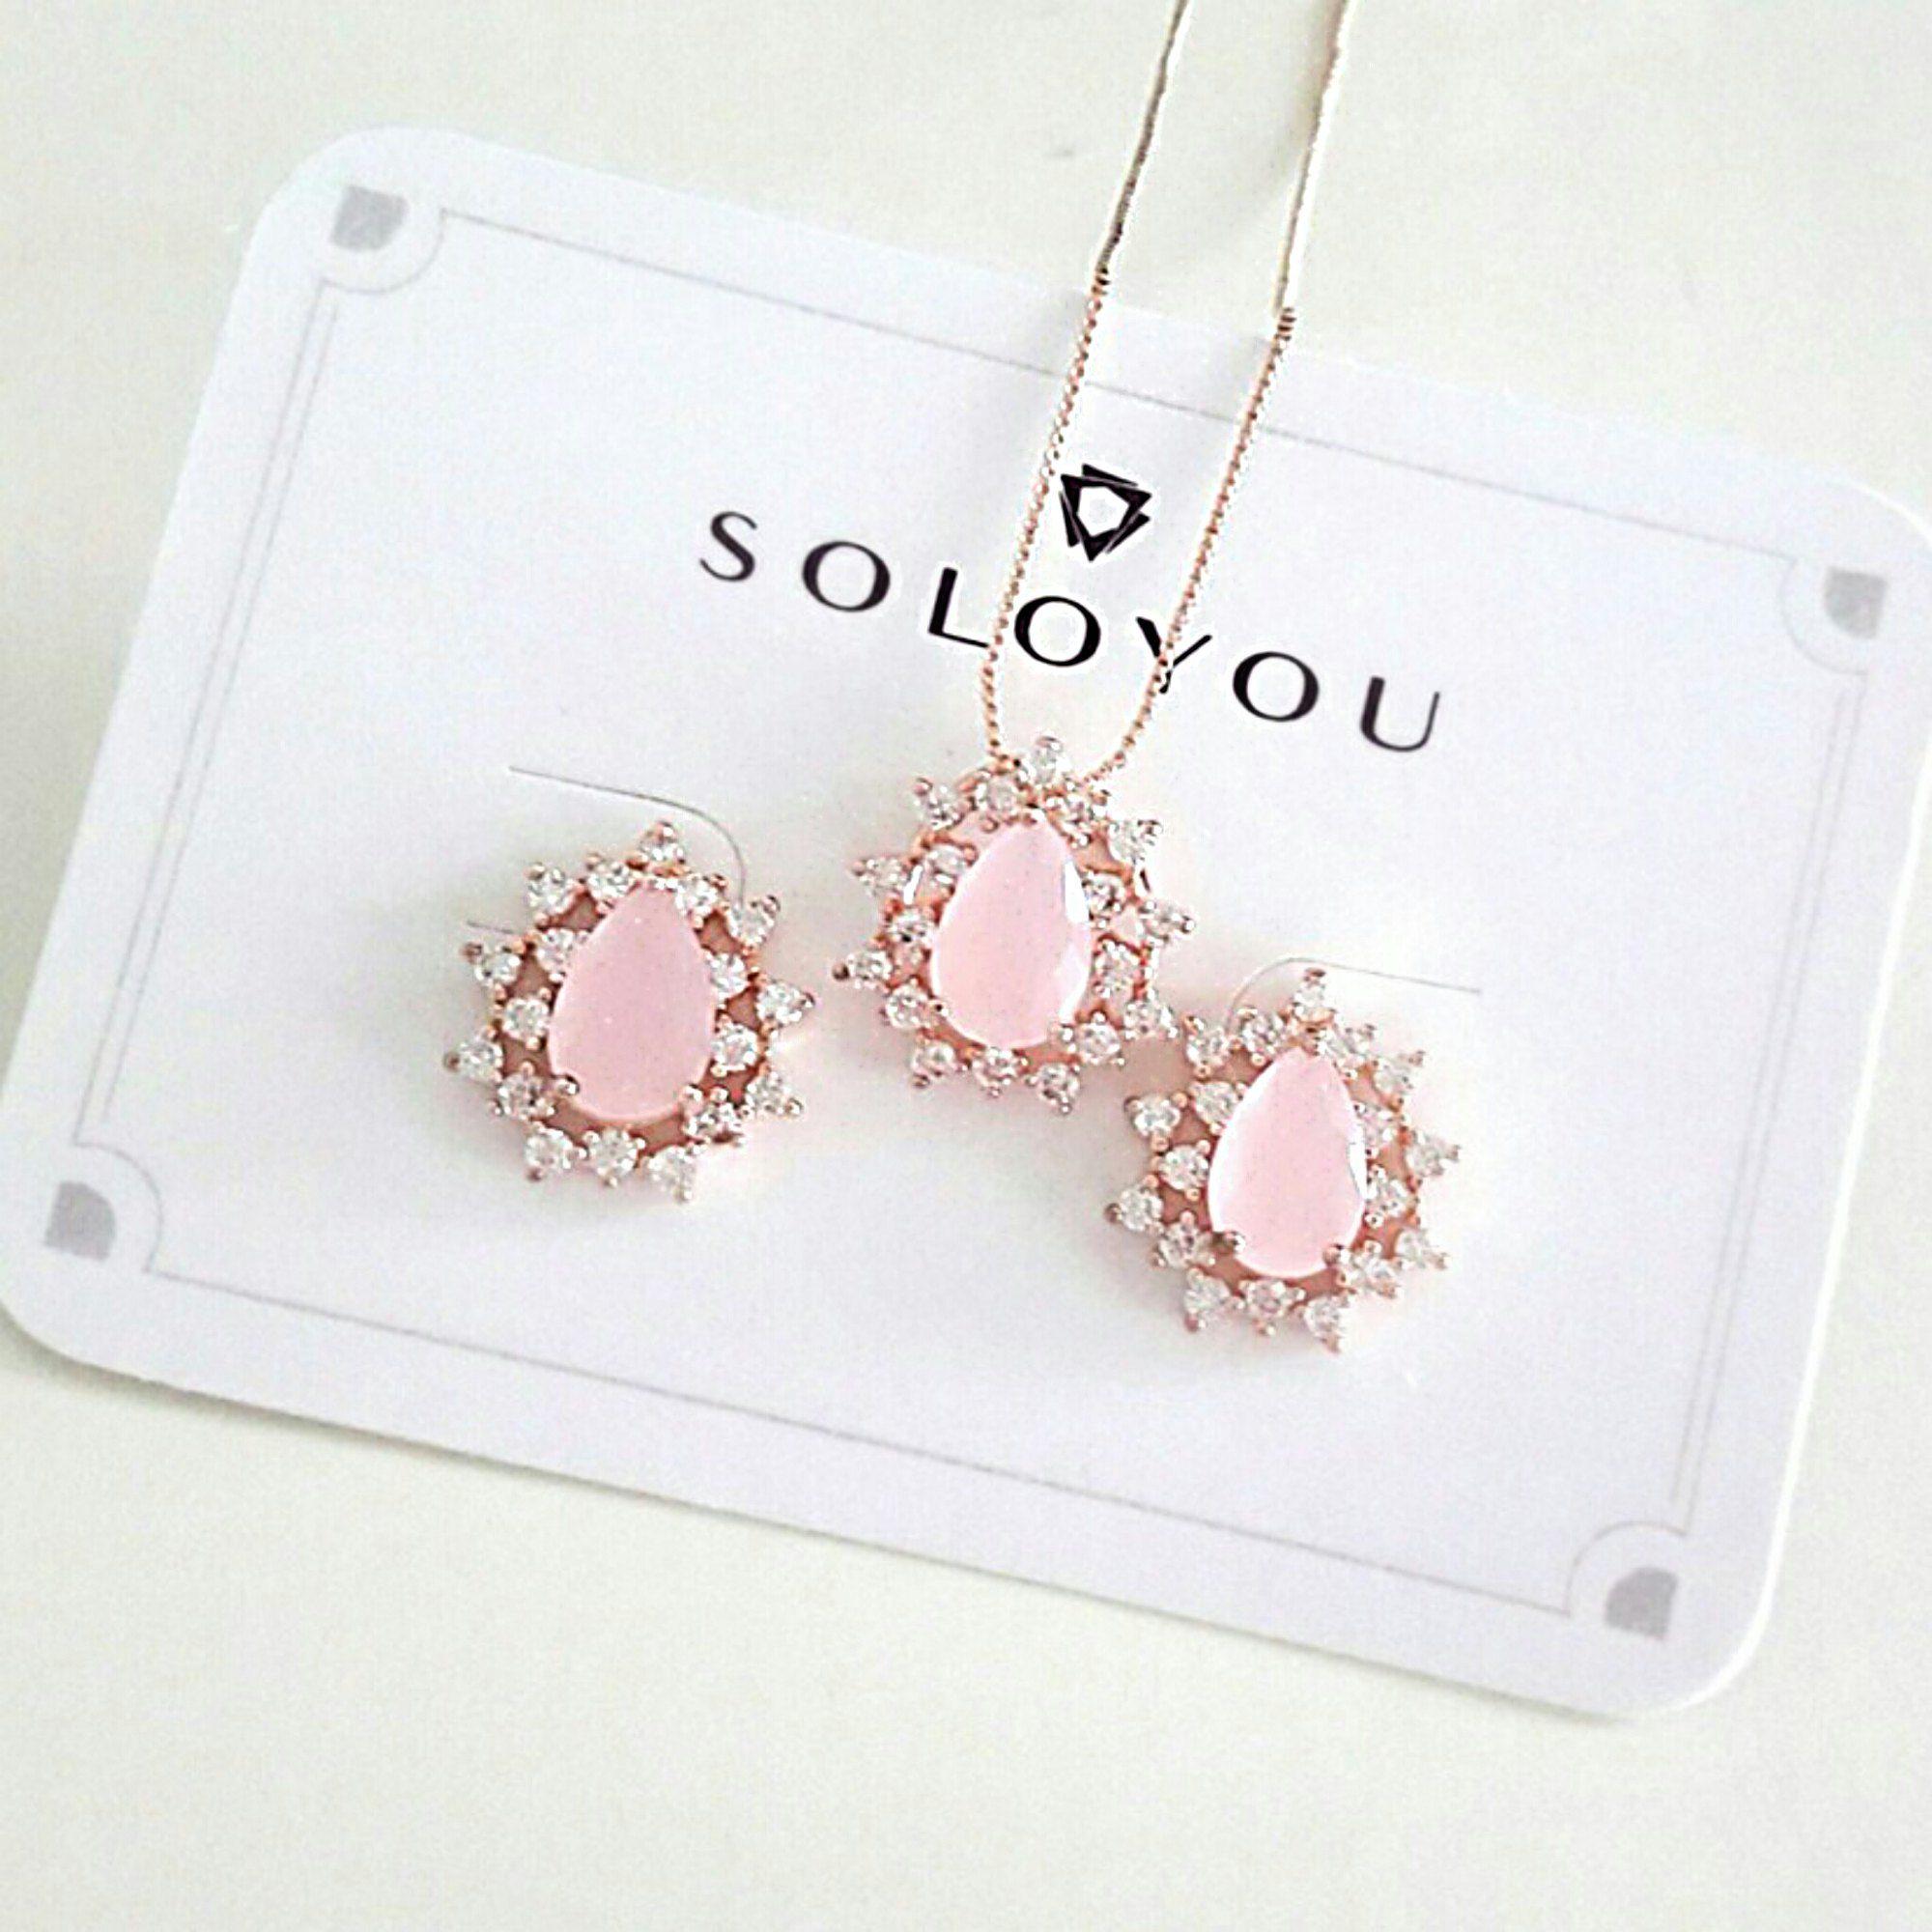 Brinco Delicado Rosa Gota Ouro Rosé Semijoia  - Soloyou